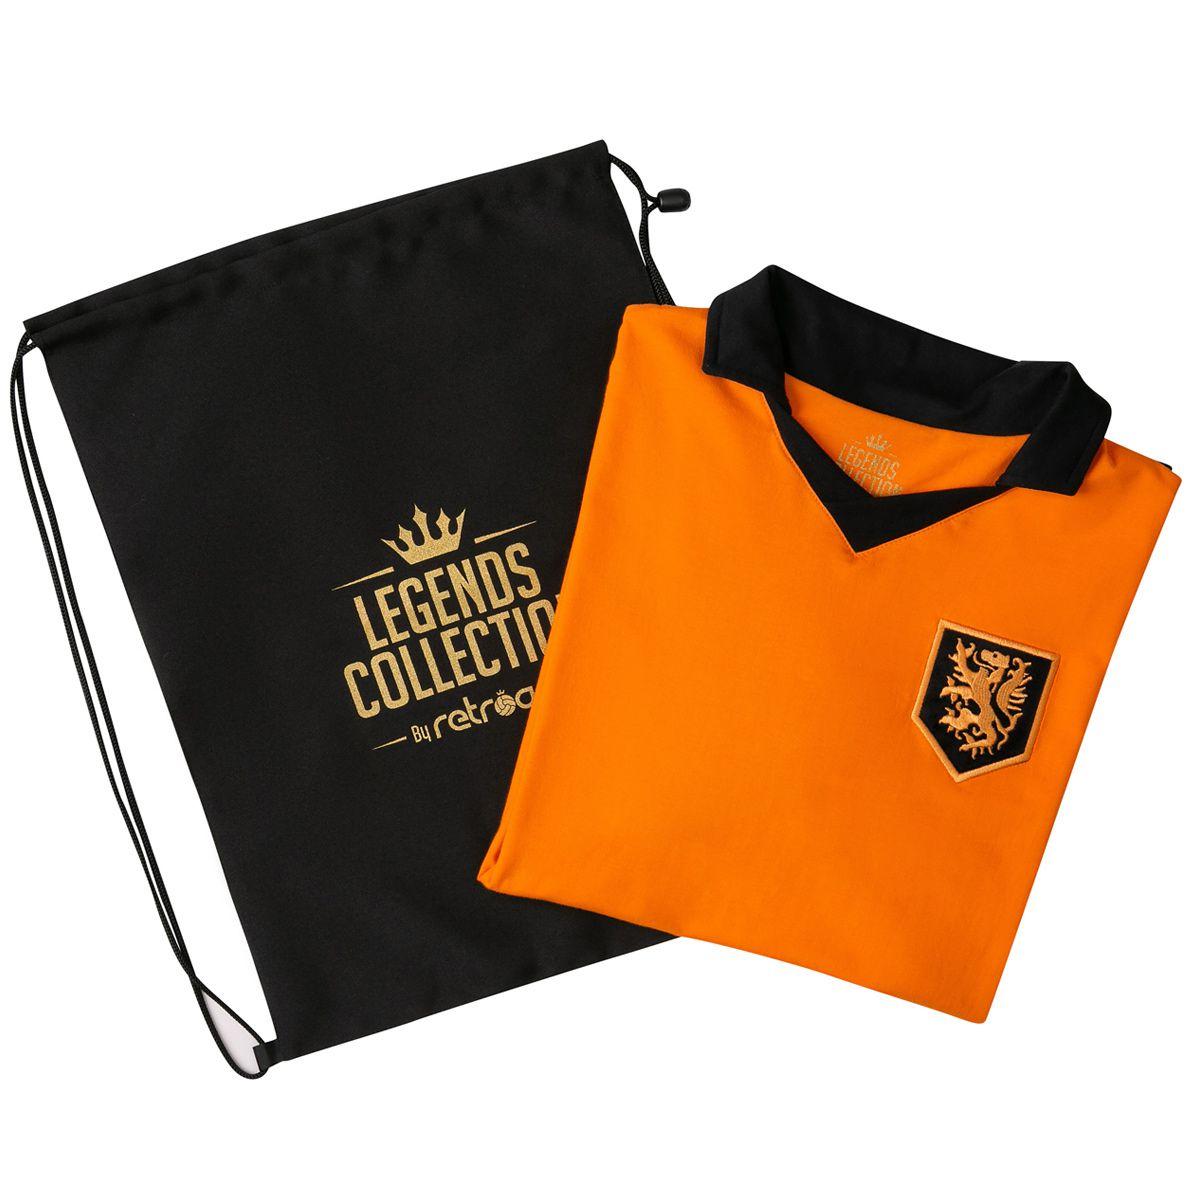 Camisa Holanda Retrô Legends Collection + Sacola